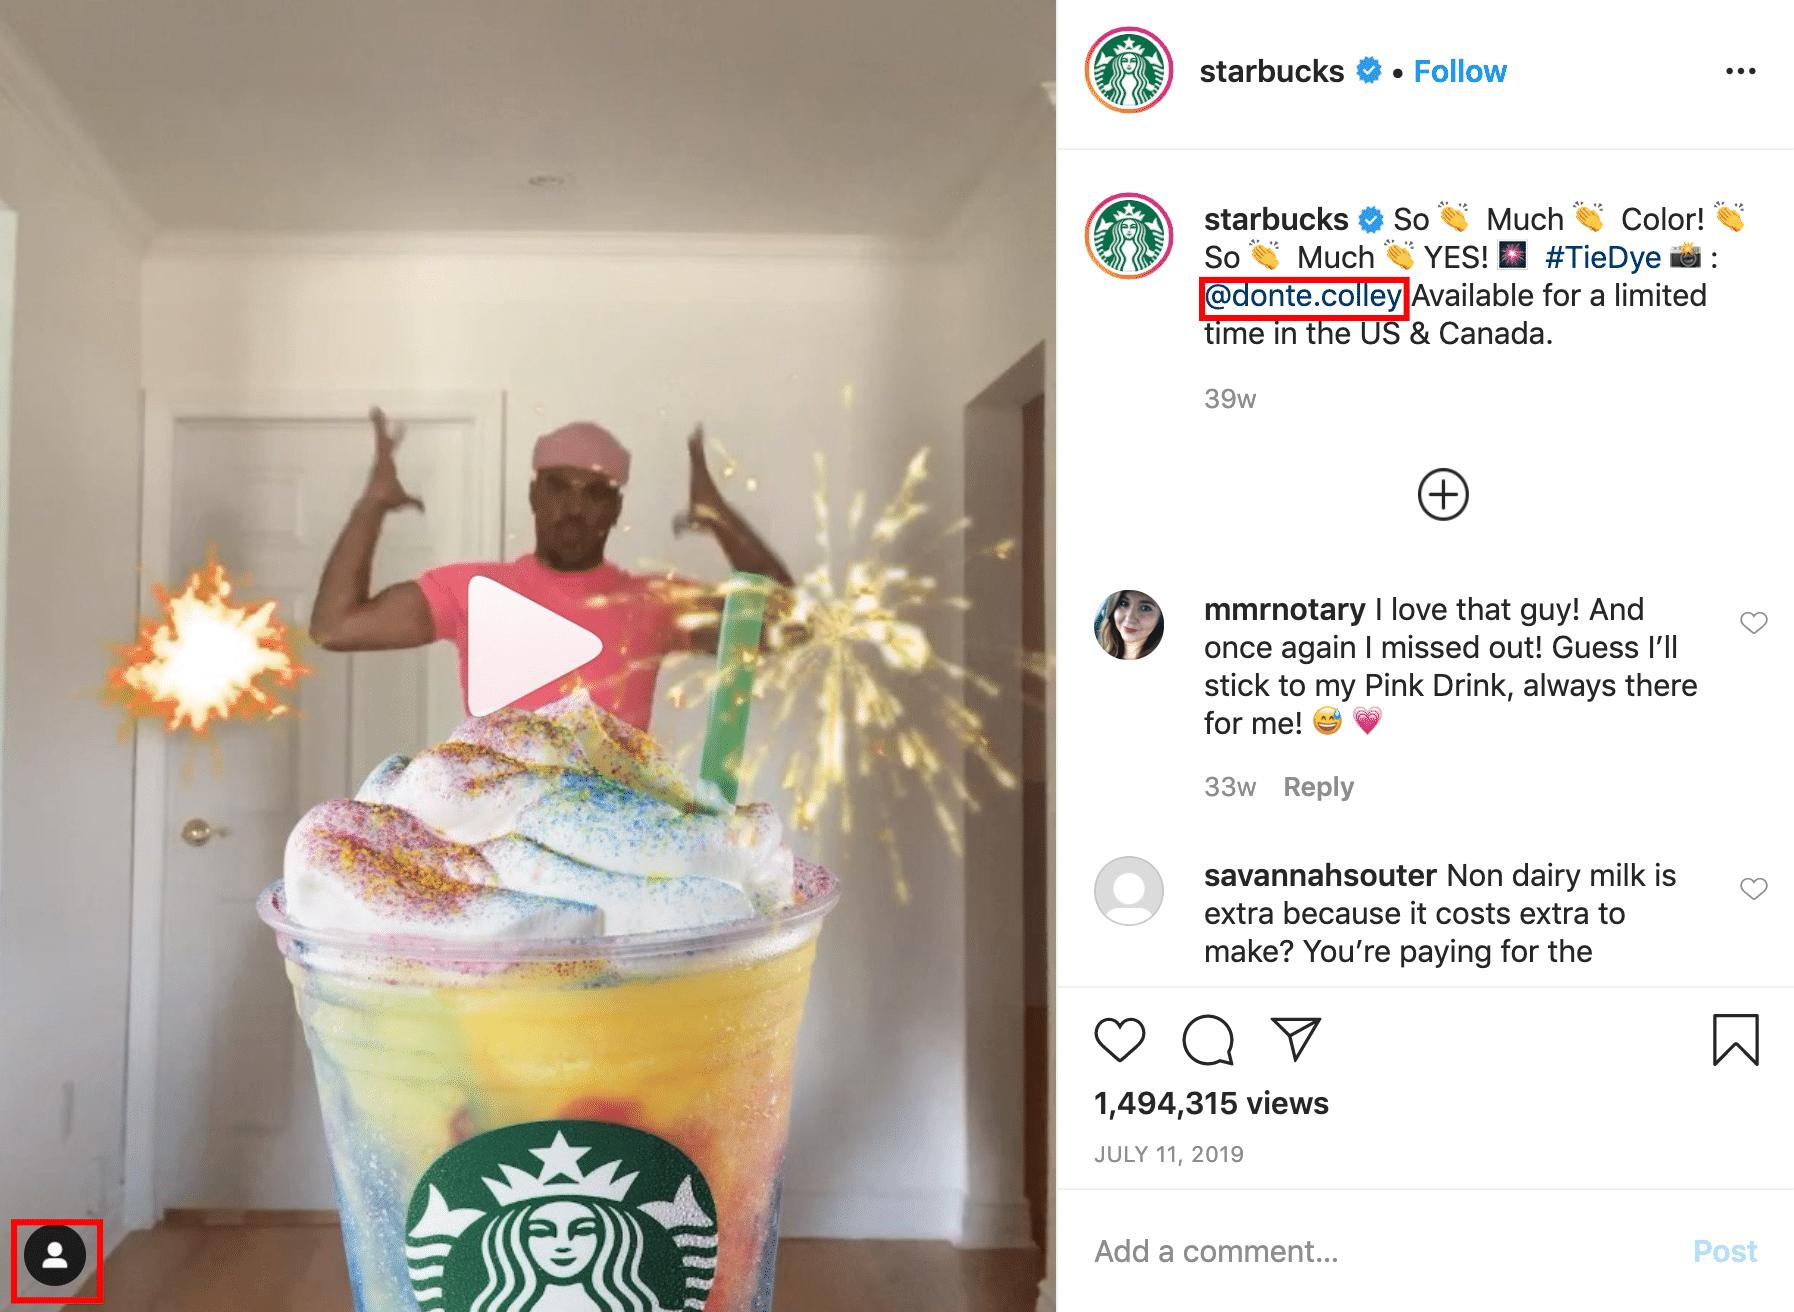 Starbucks - So much color instagram video